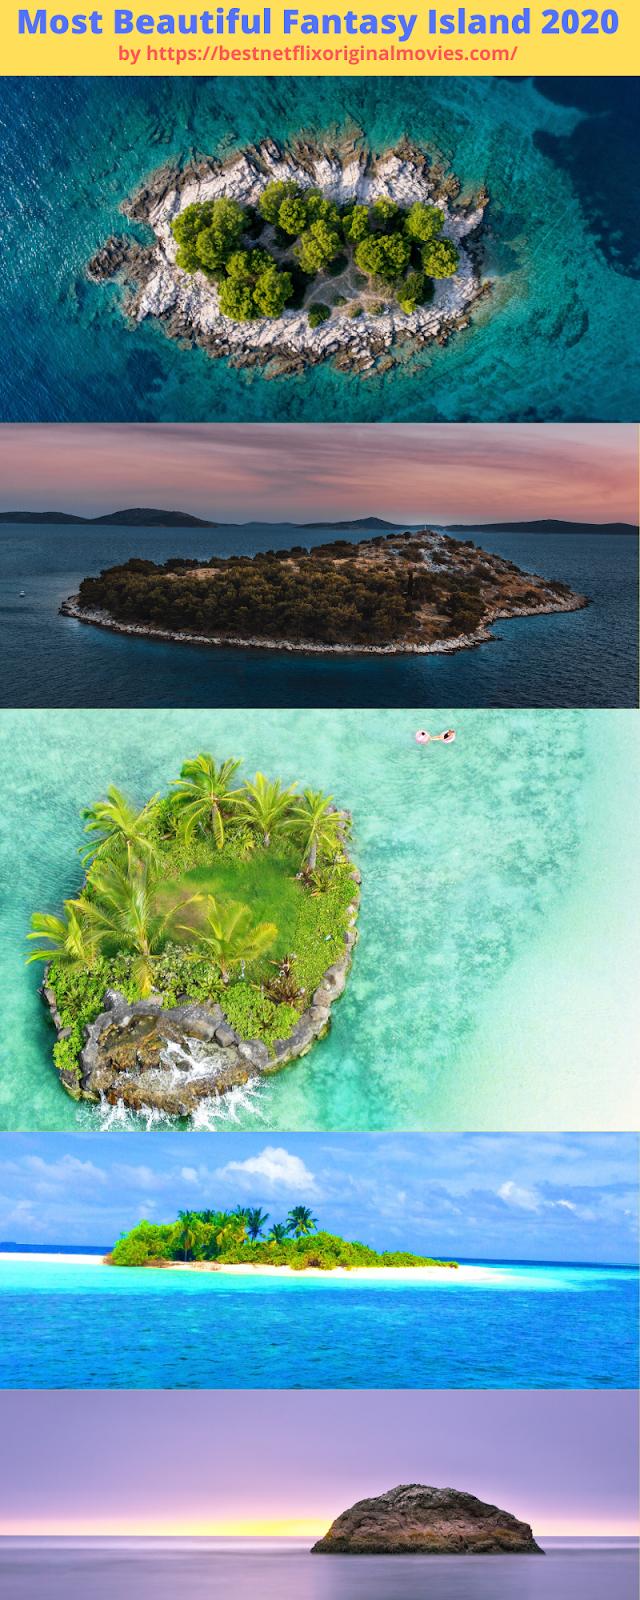 Most beautiful Fantasy Island 2020, [BEST REVIEW] Netflix Fantasy Island 2020 |The horror Movie